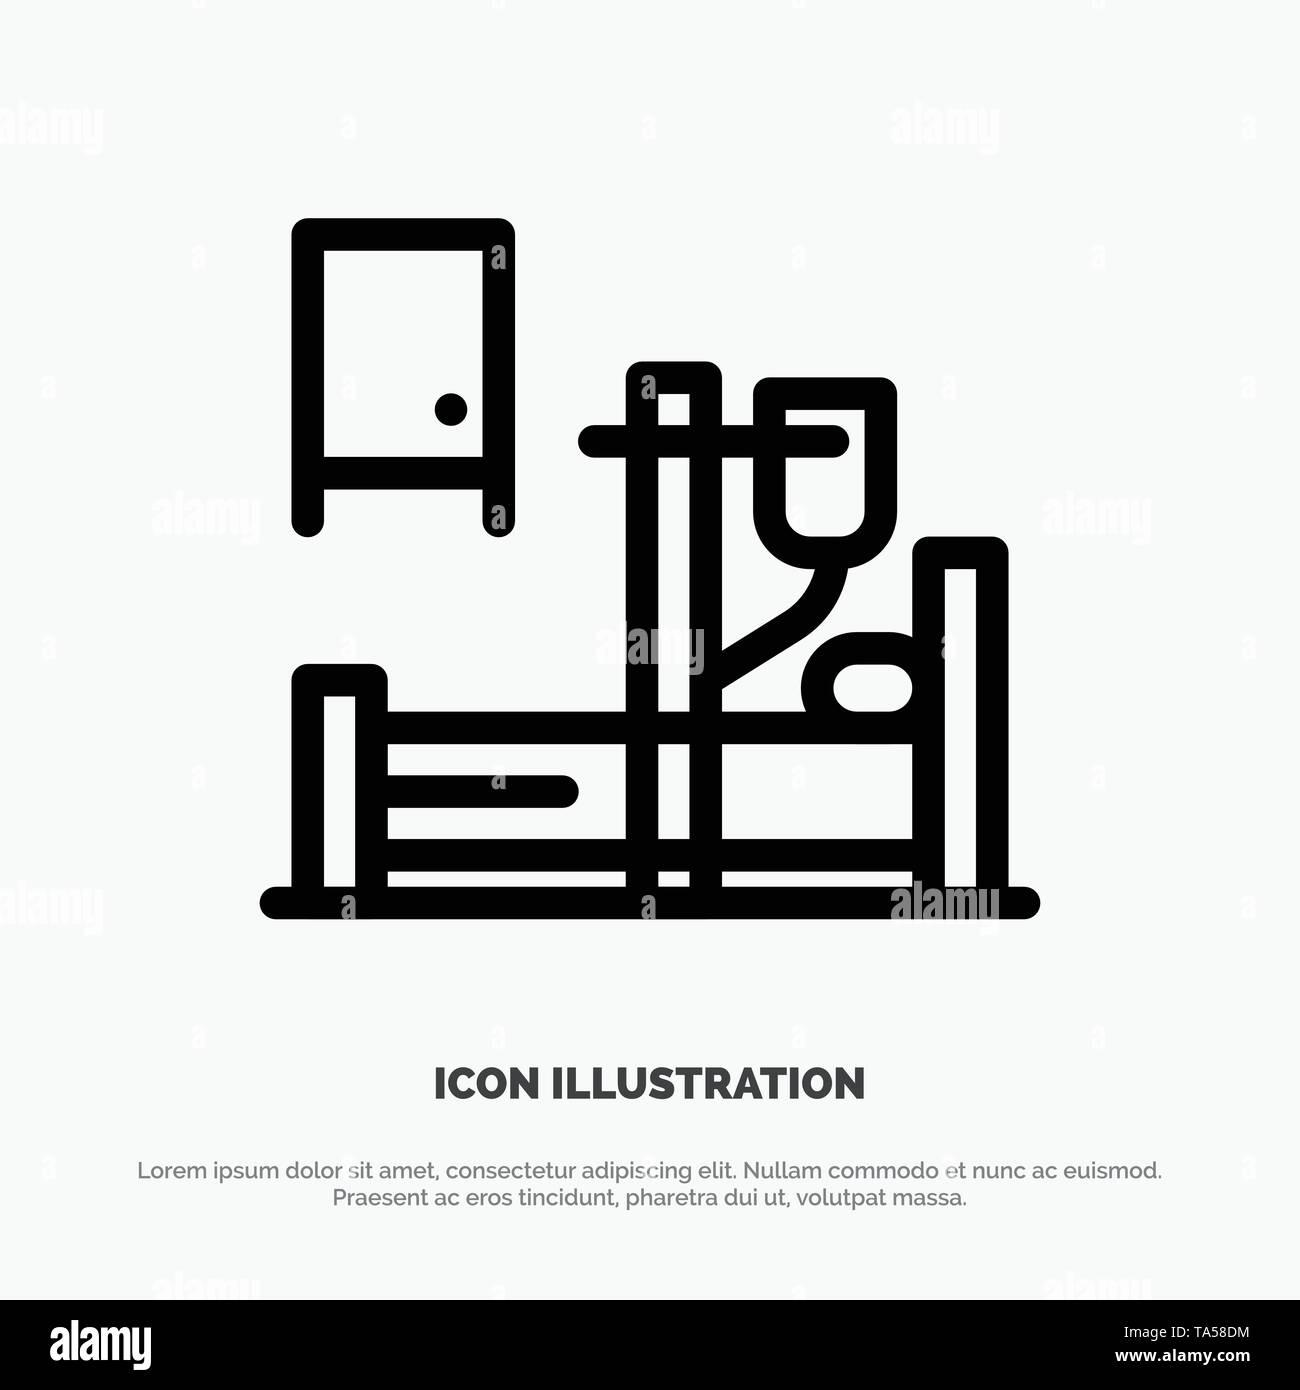 Medical, Drip, Medicine, Hospital Line Icon Vector - Stock Image